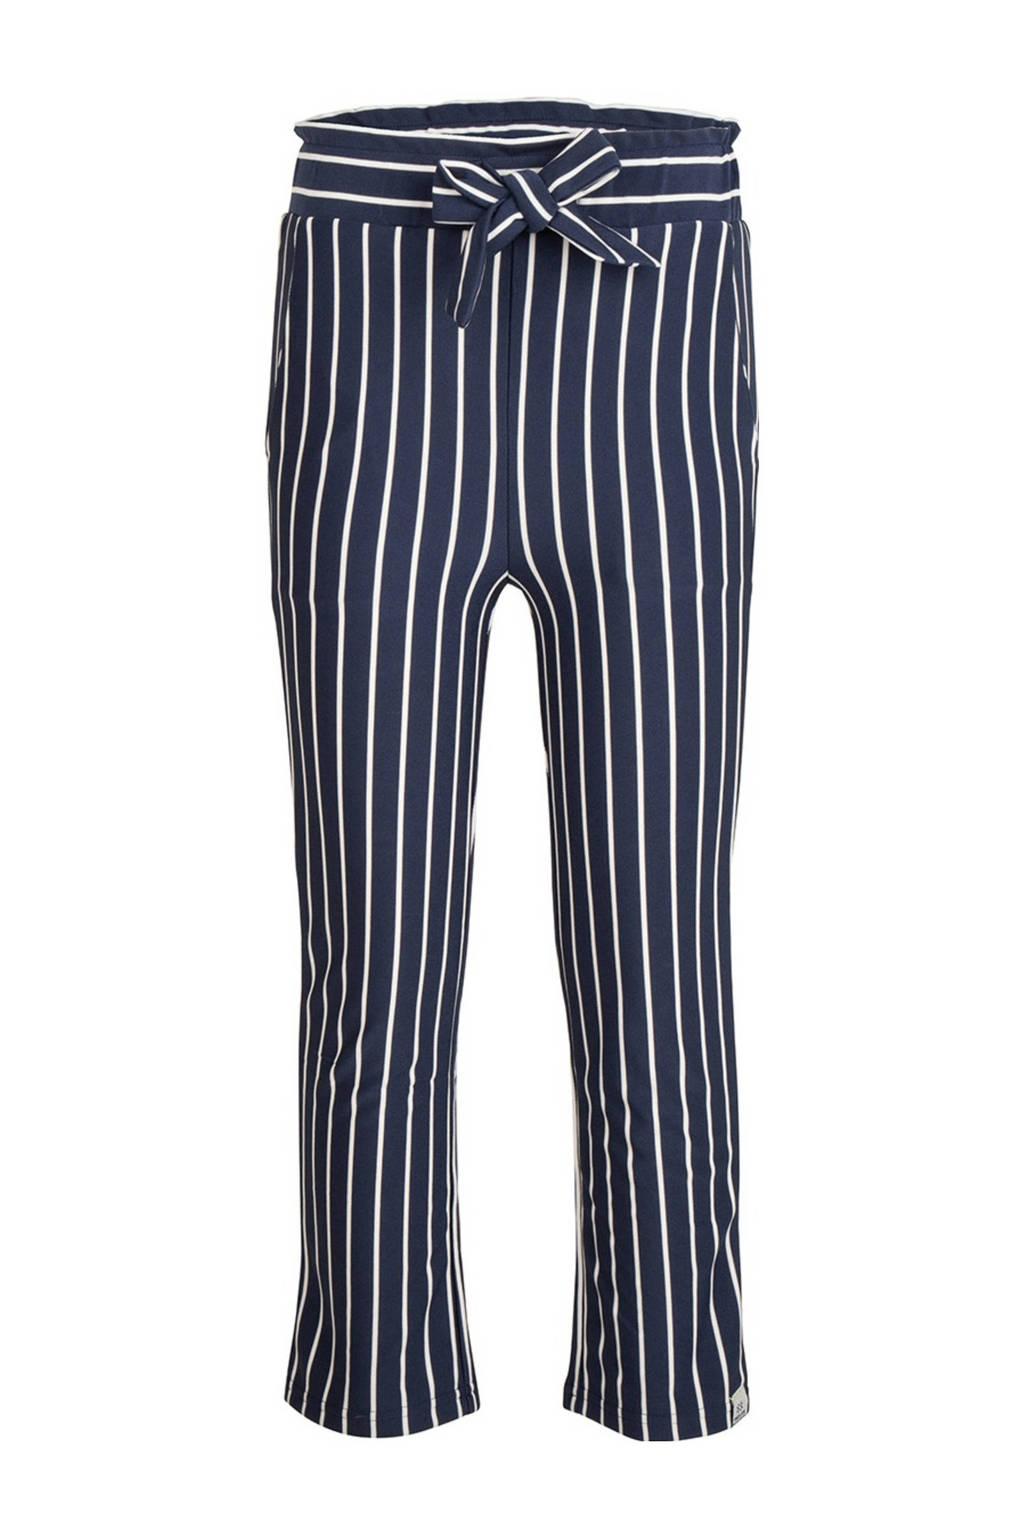 Indian Blue Jeans gestreepte loose fit broek donkerblauw/wit, Donkerblauw/wit